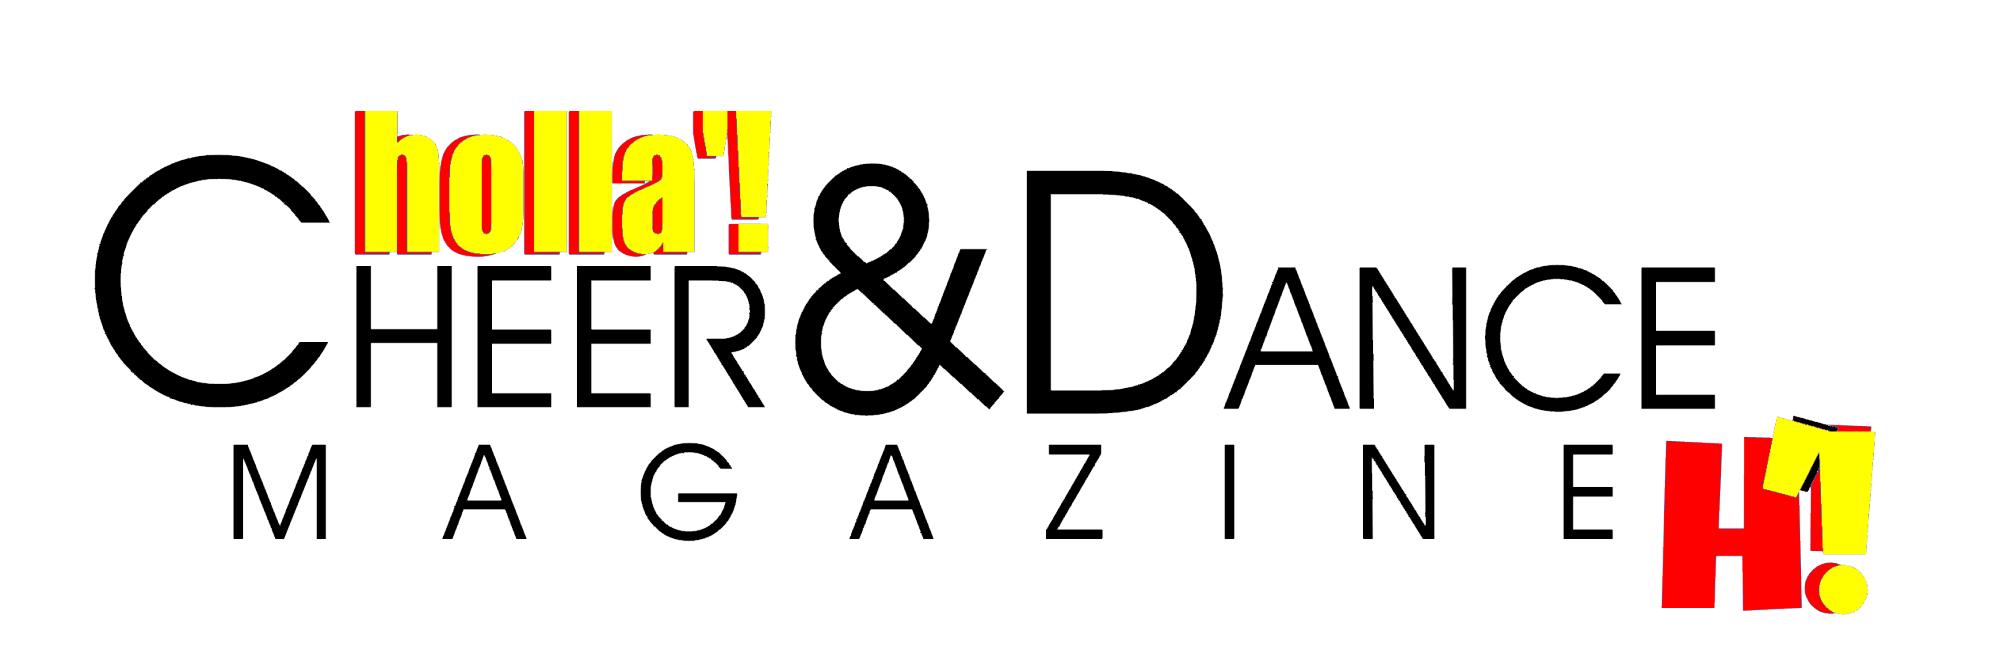 Holla-Cheer-Dance-Magazine